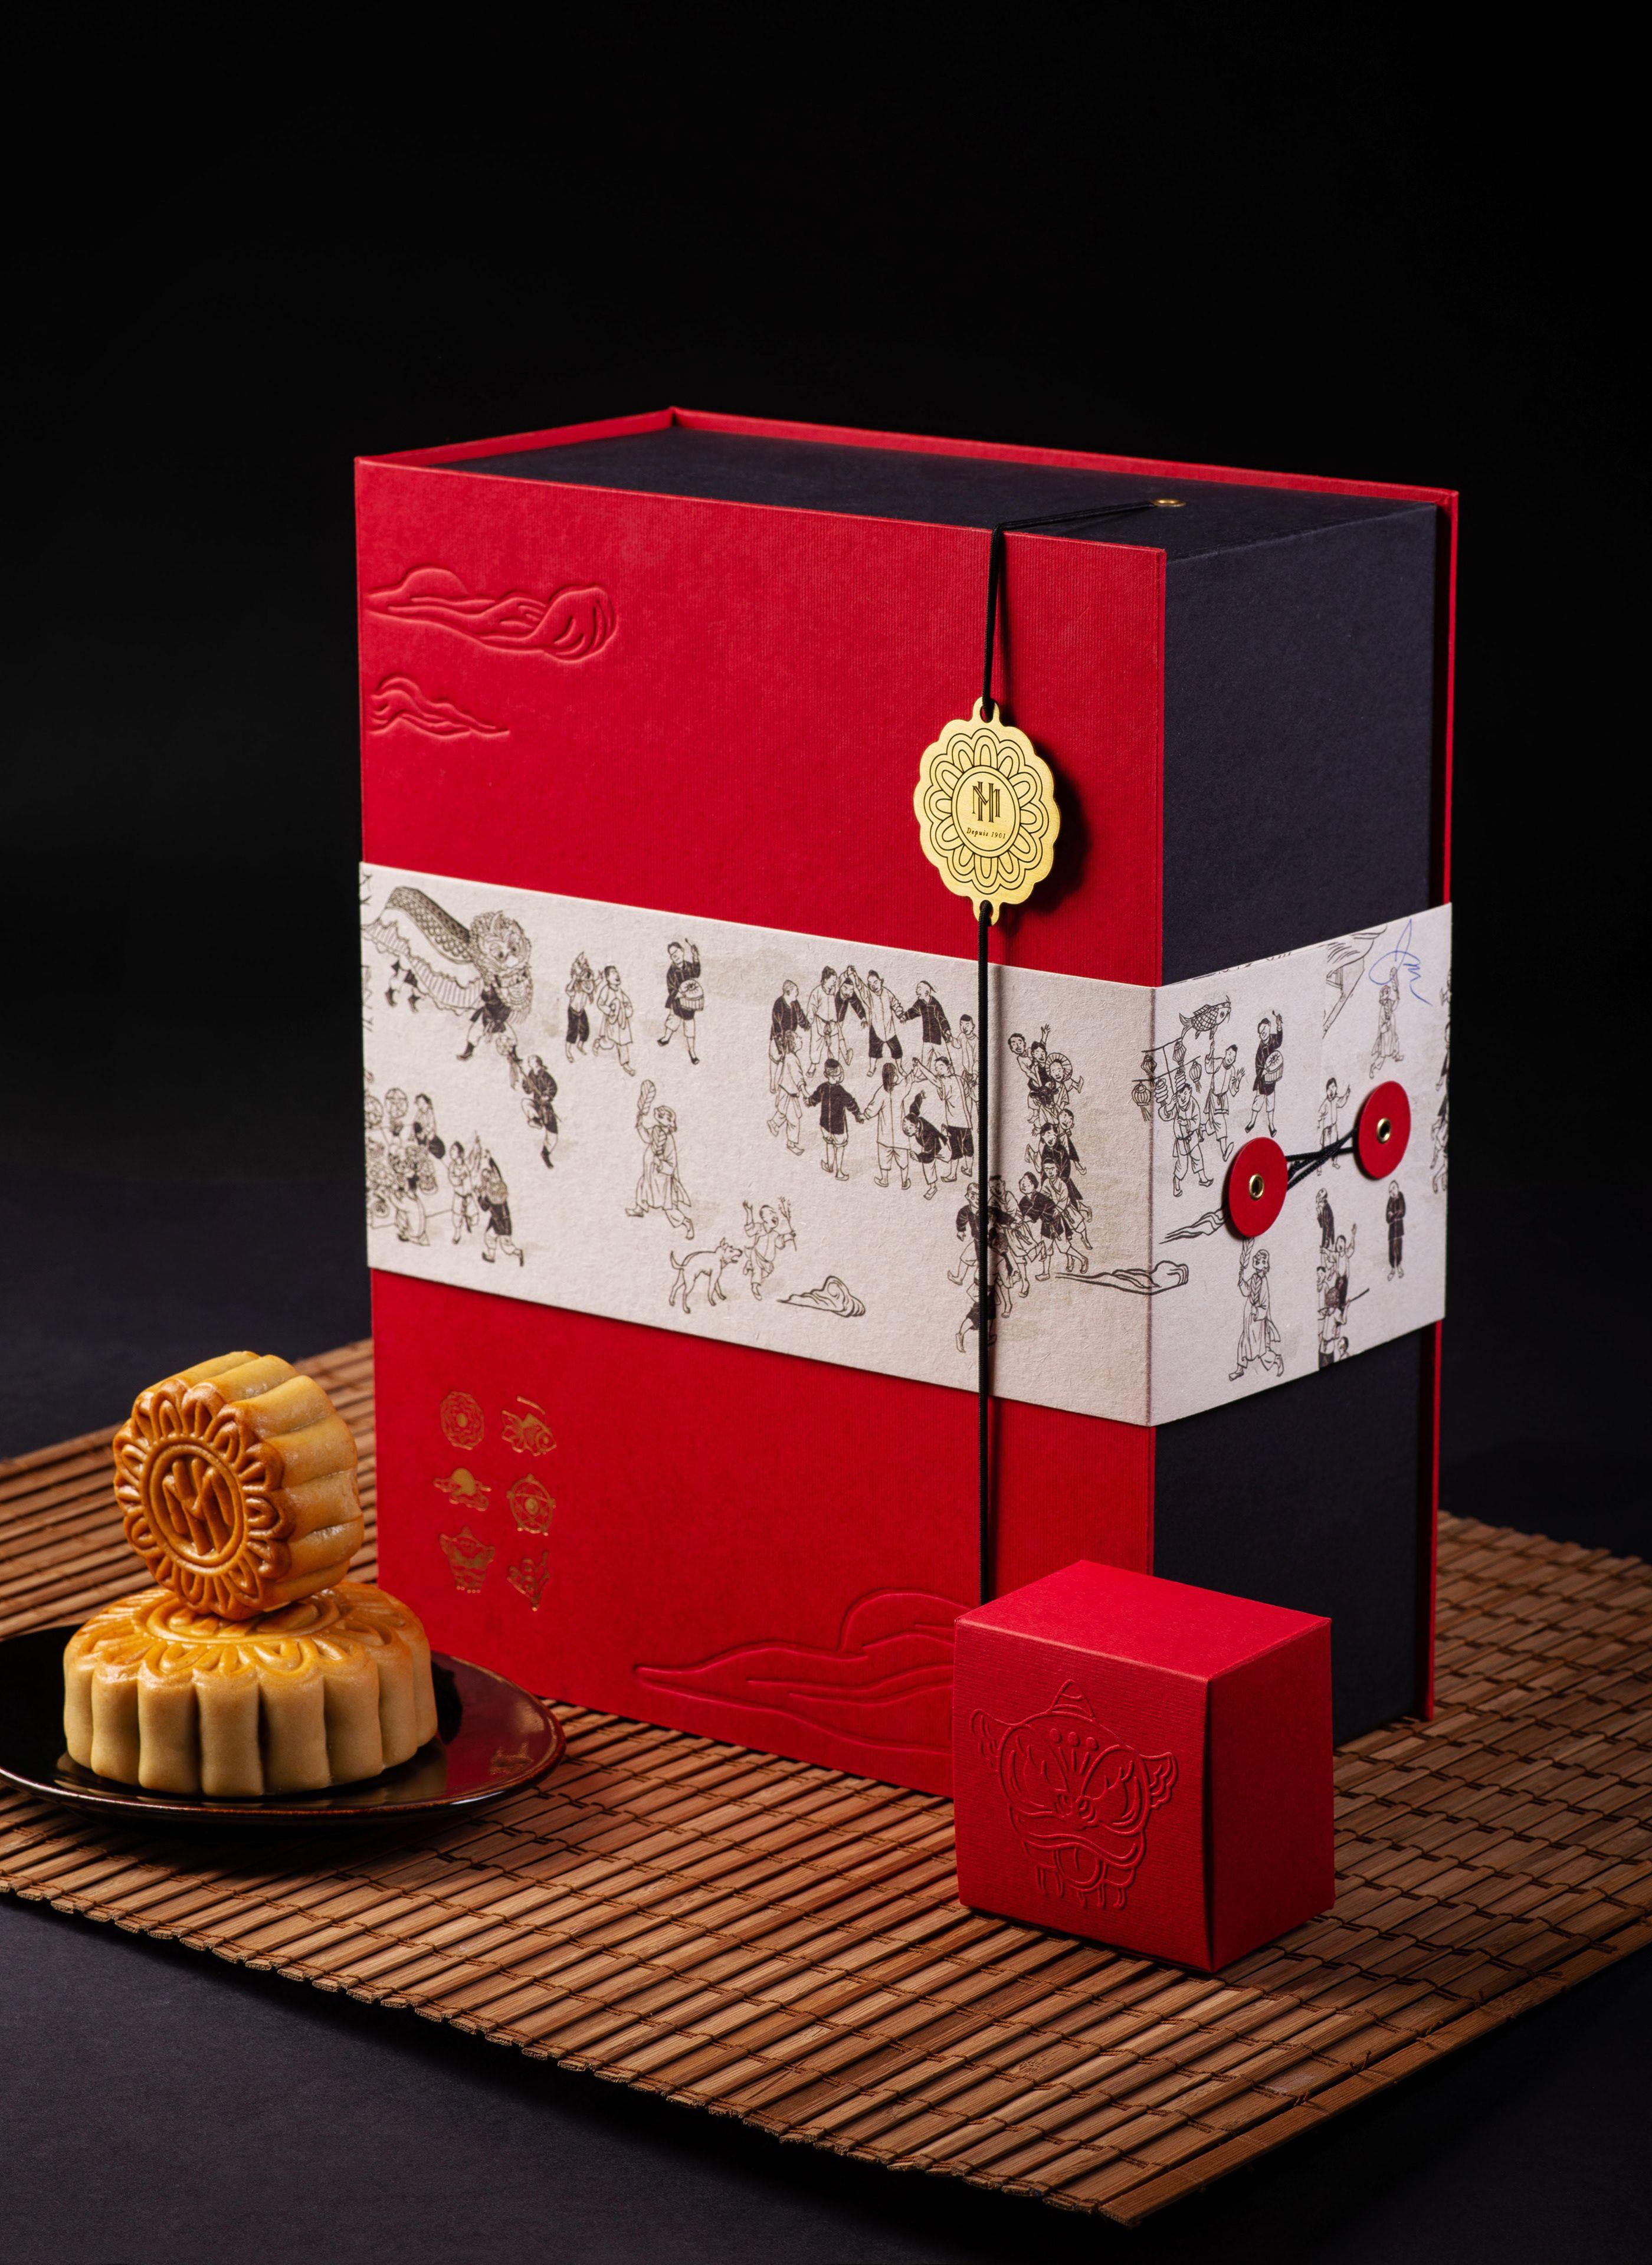 Sofitel Legend Metropole Hanoi Mooncake Box 2018 On Behance Packaging Design Trends Creative Packaging Design Moon Cake